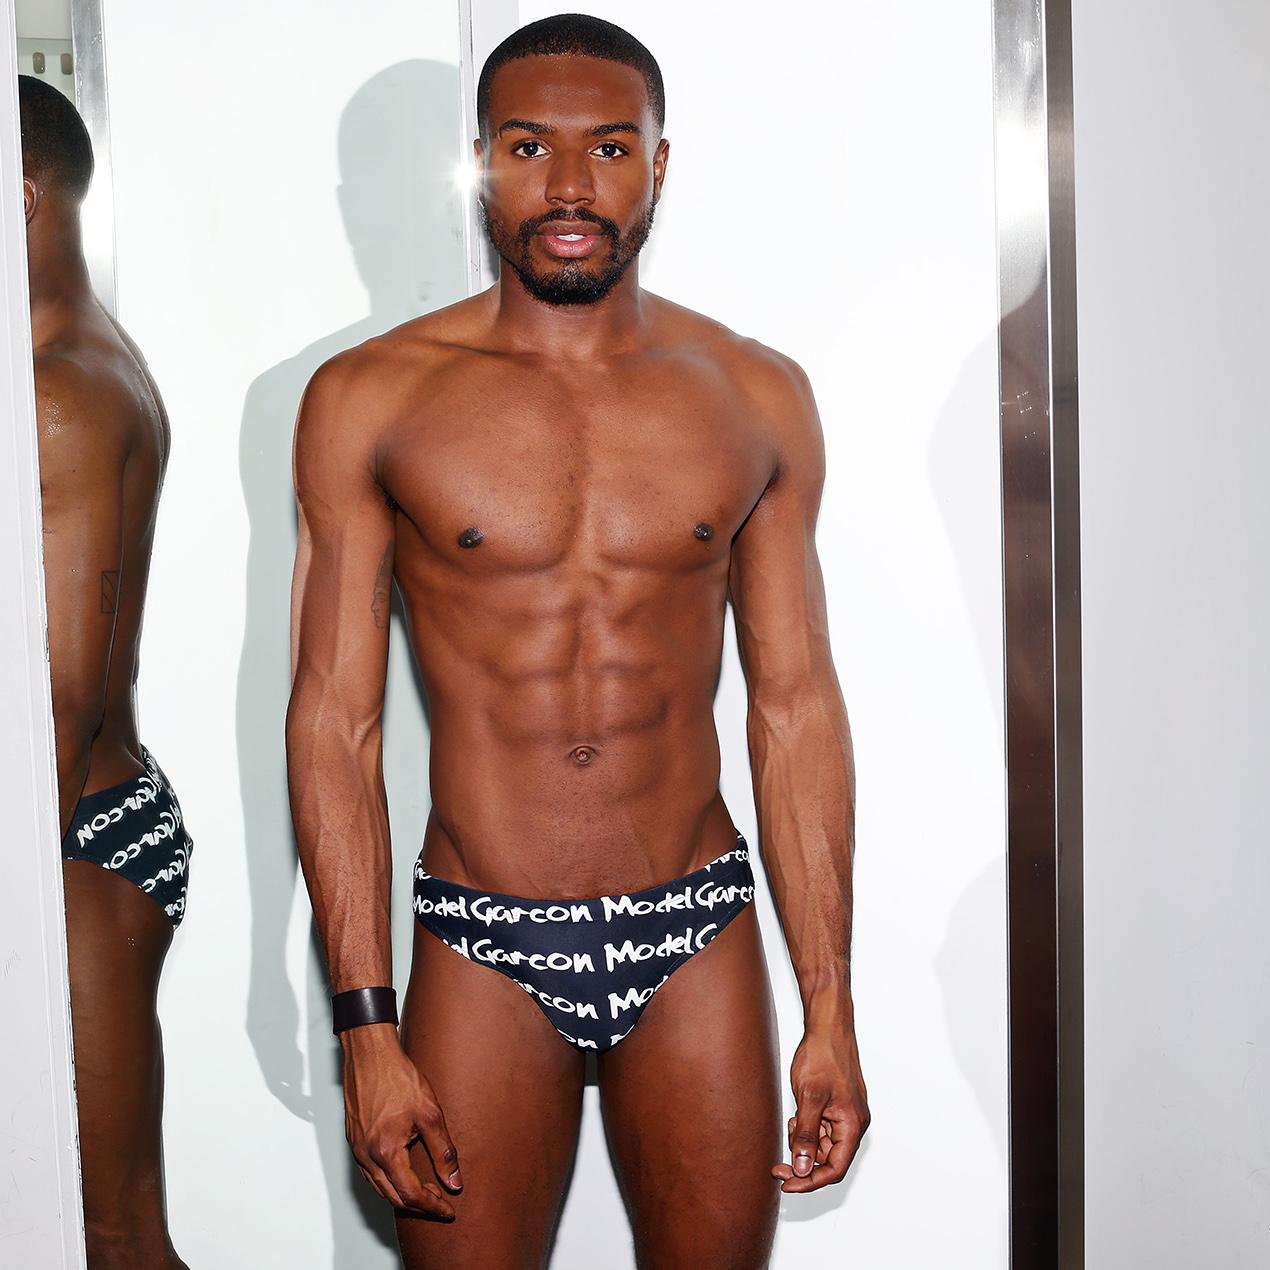 Garcon Model - New Model Andre